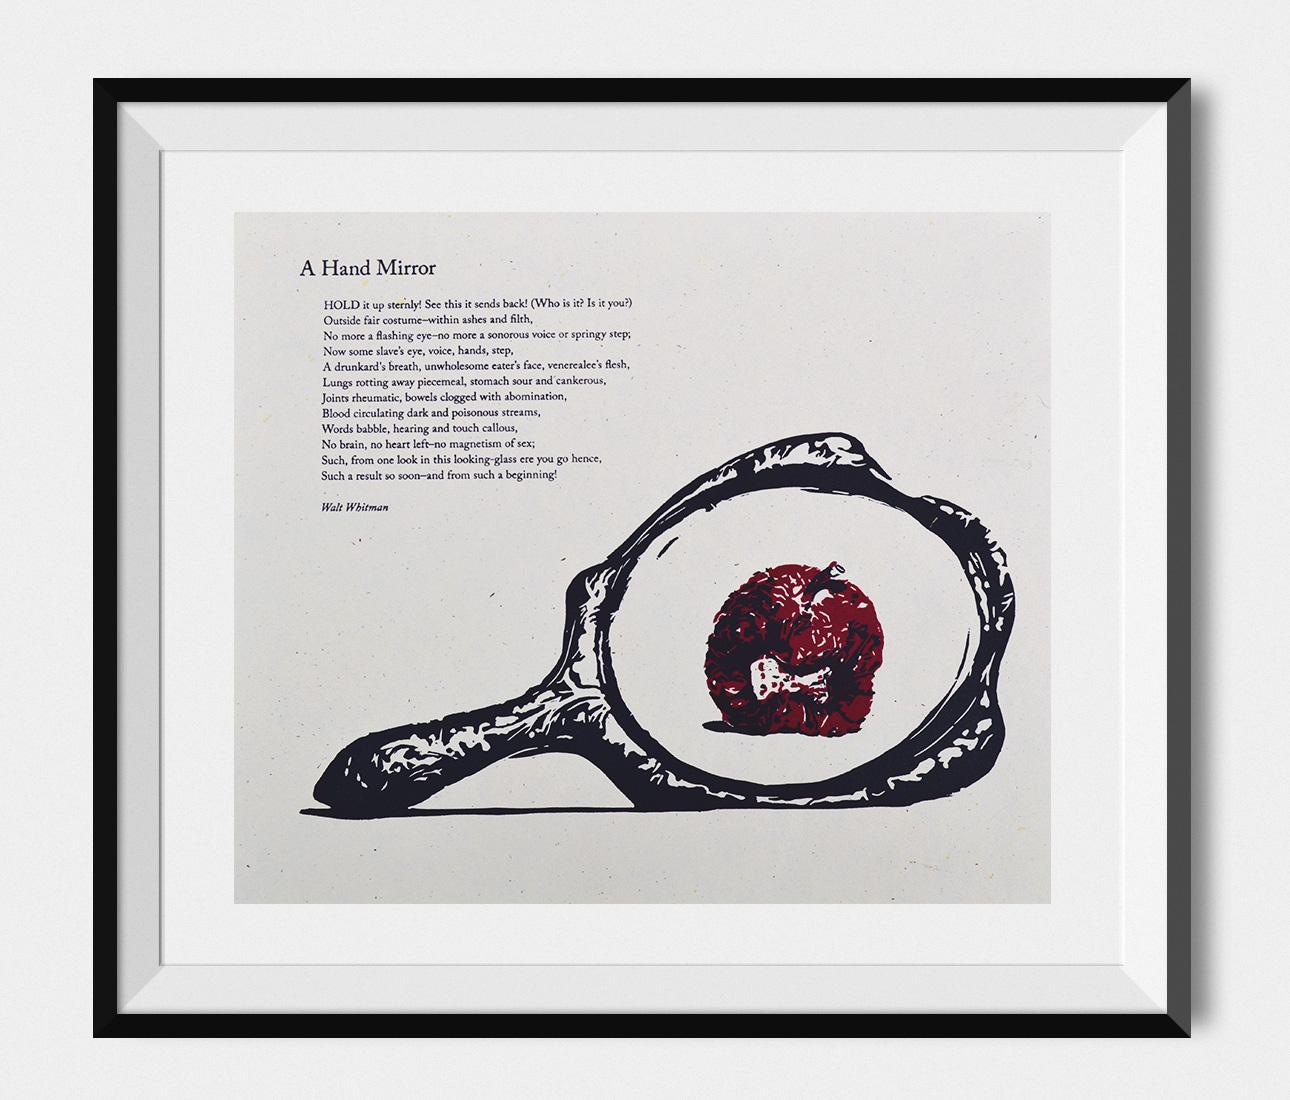 Letterpress — Hand-cut linoleum and handset Garamond foundrytype